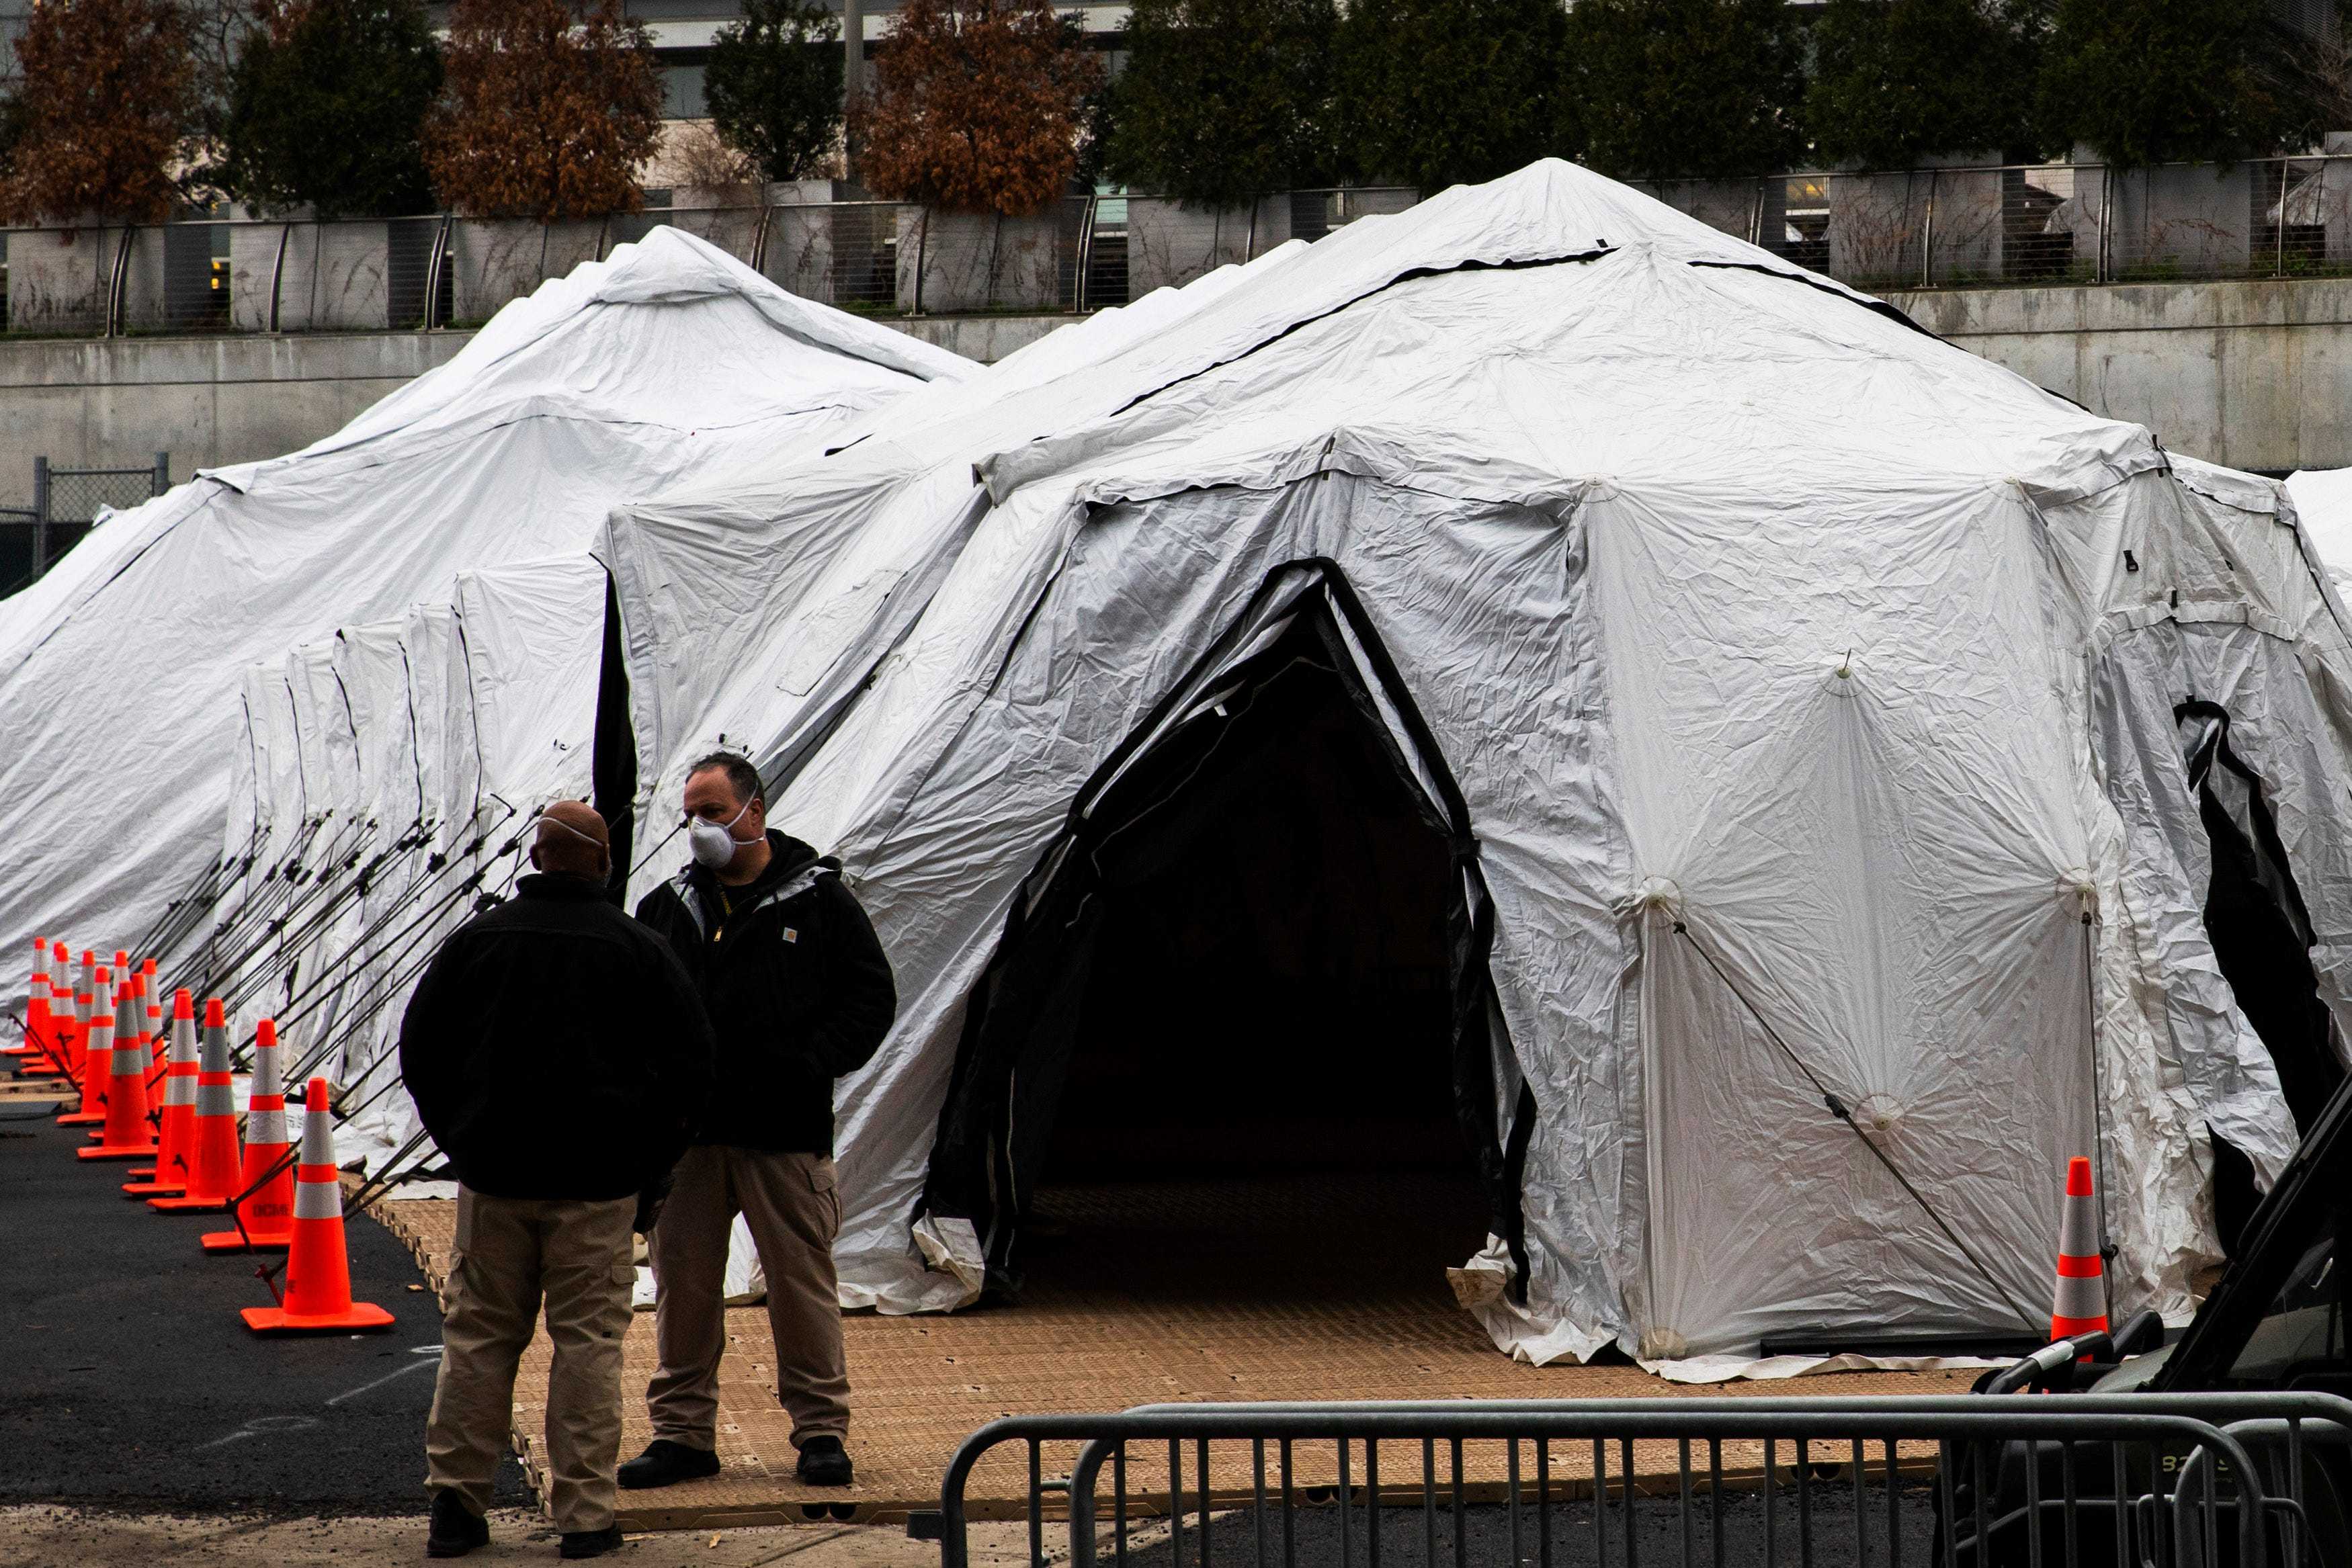 People speak near a makeshift morgue outside Bellevue Hospital on March 25 in New York City.